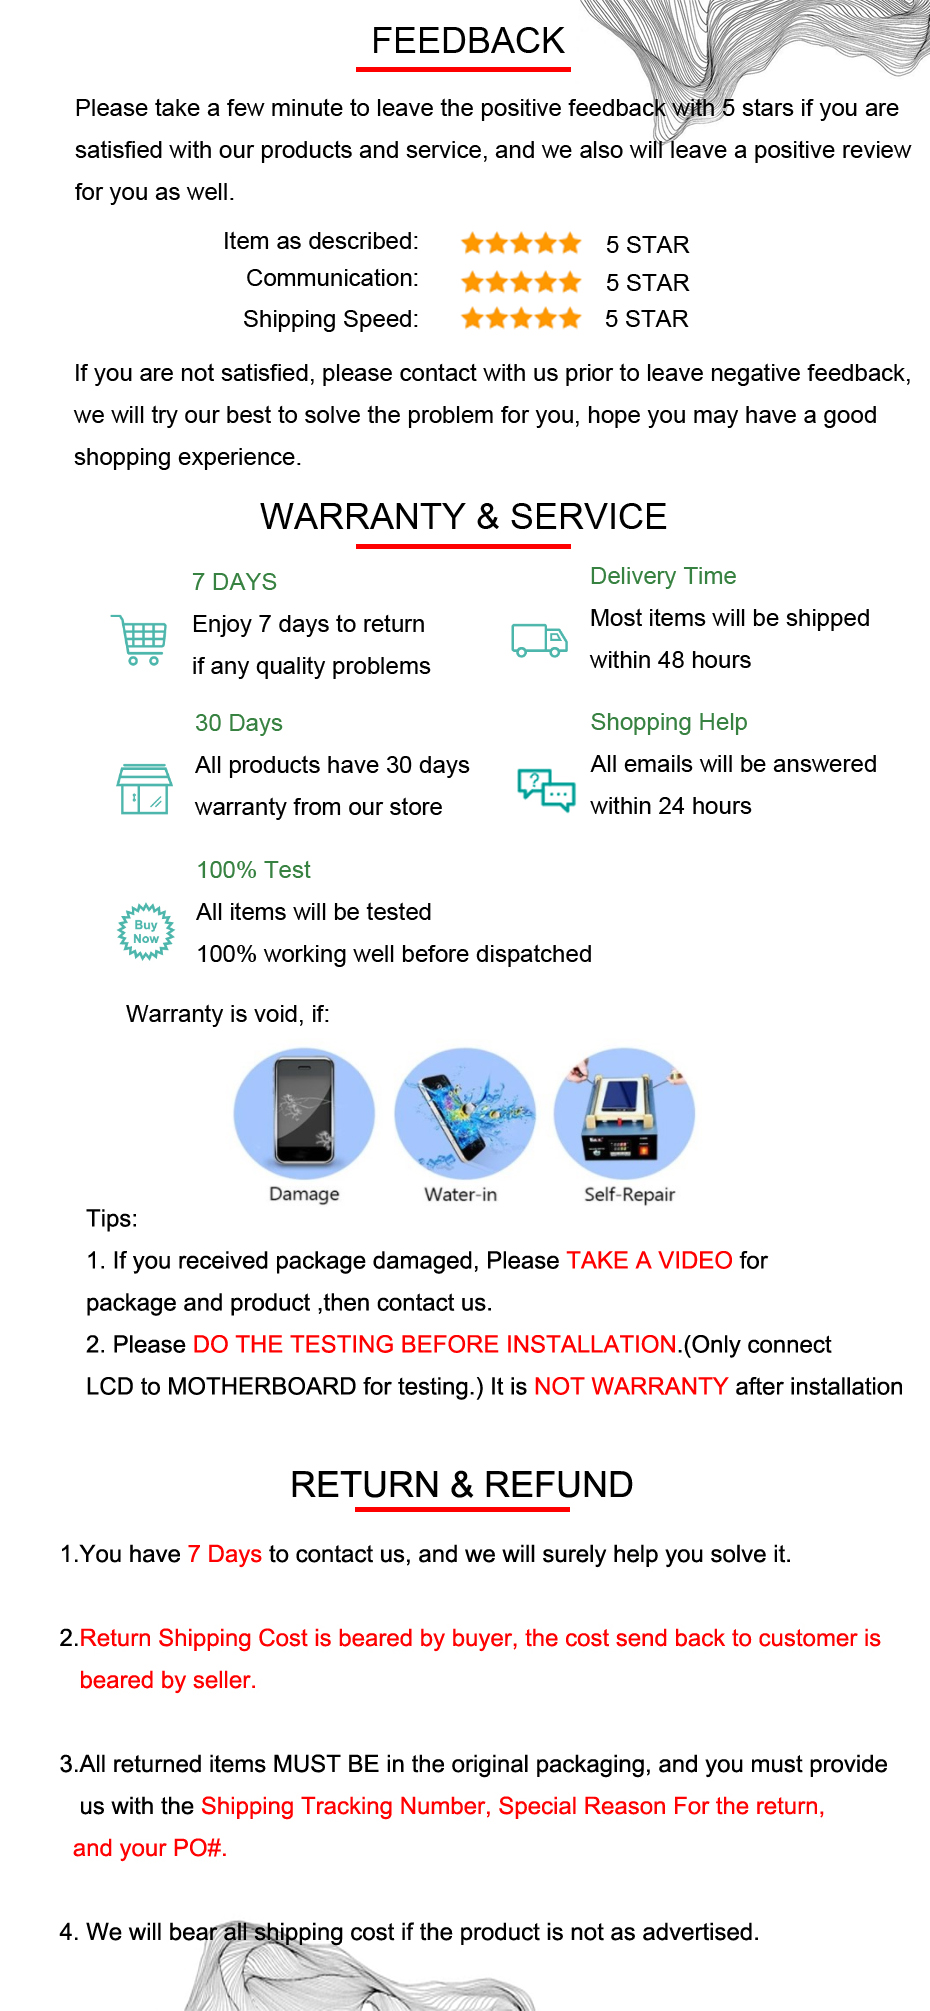 feedback+warranty+return